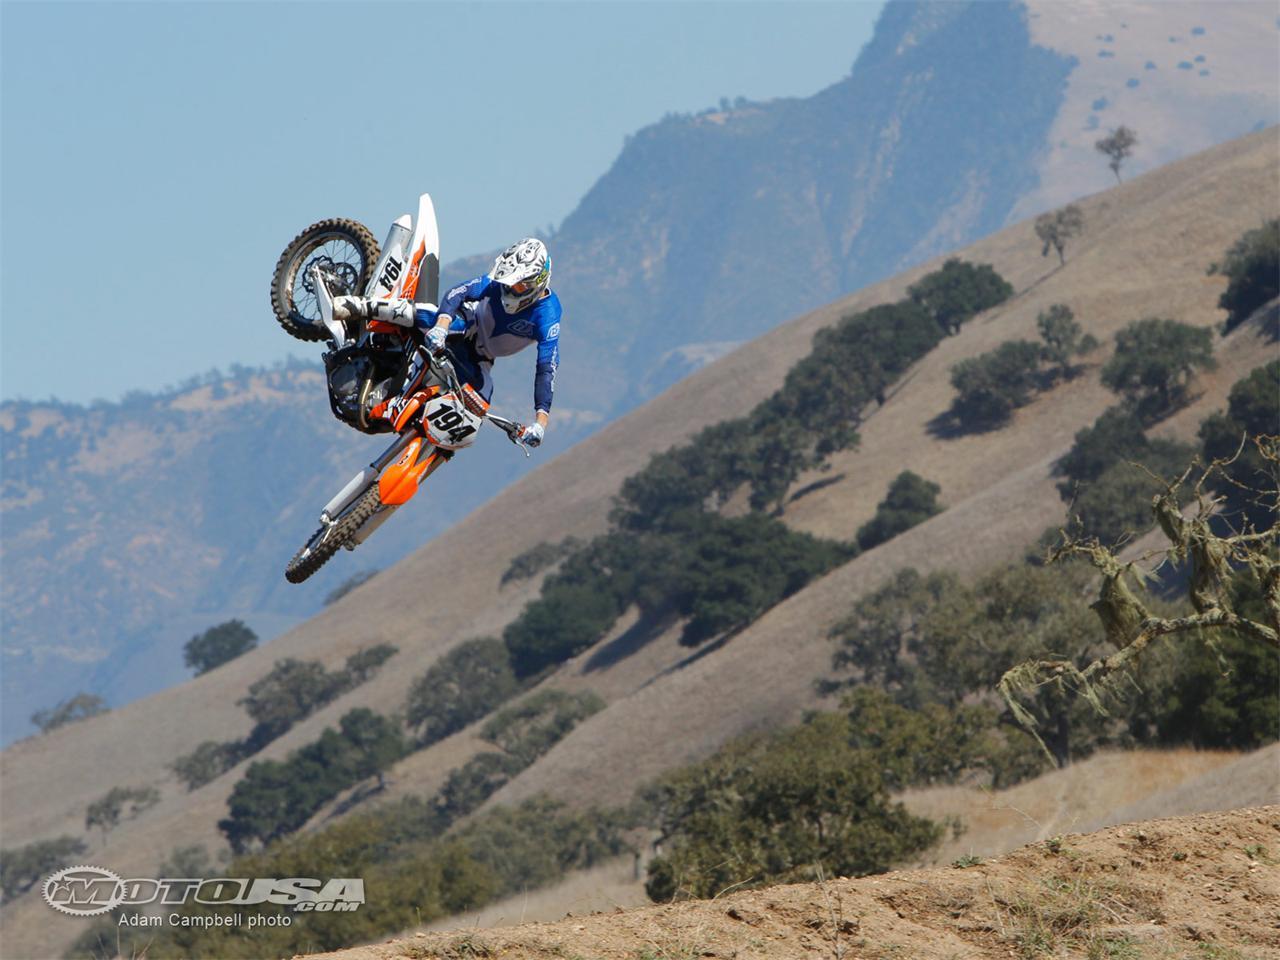 Dirt Bikes Hd Wallpapers: Motocross Screensavers Wallpapers